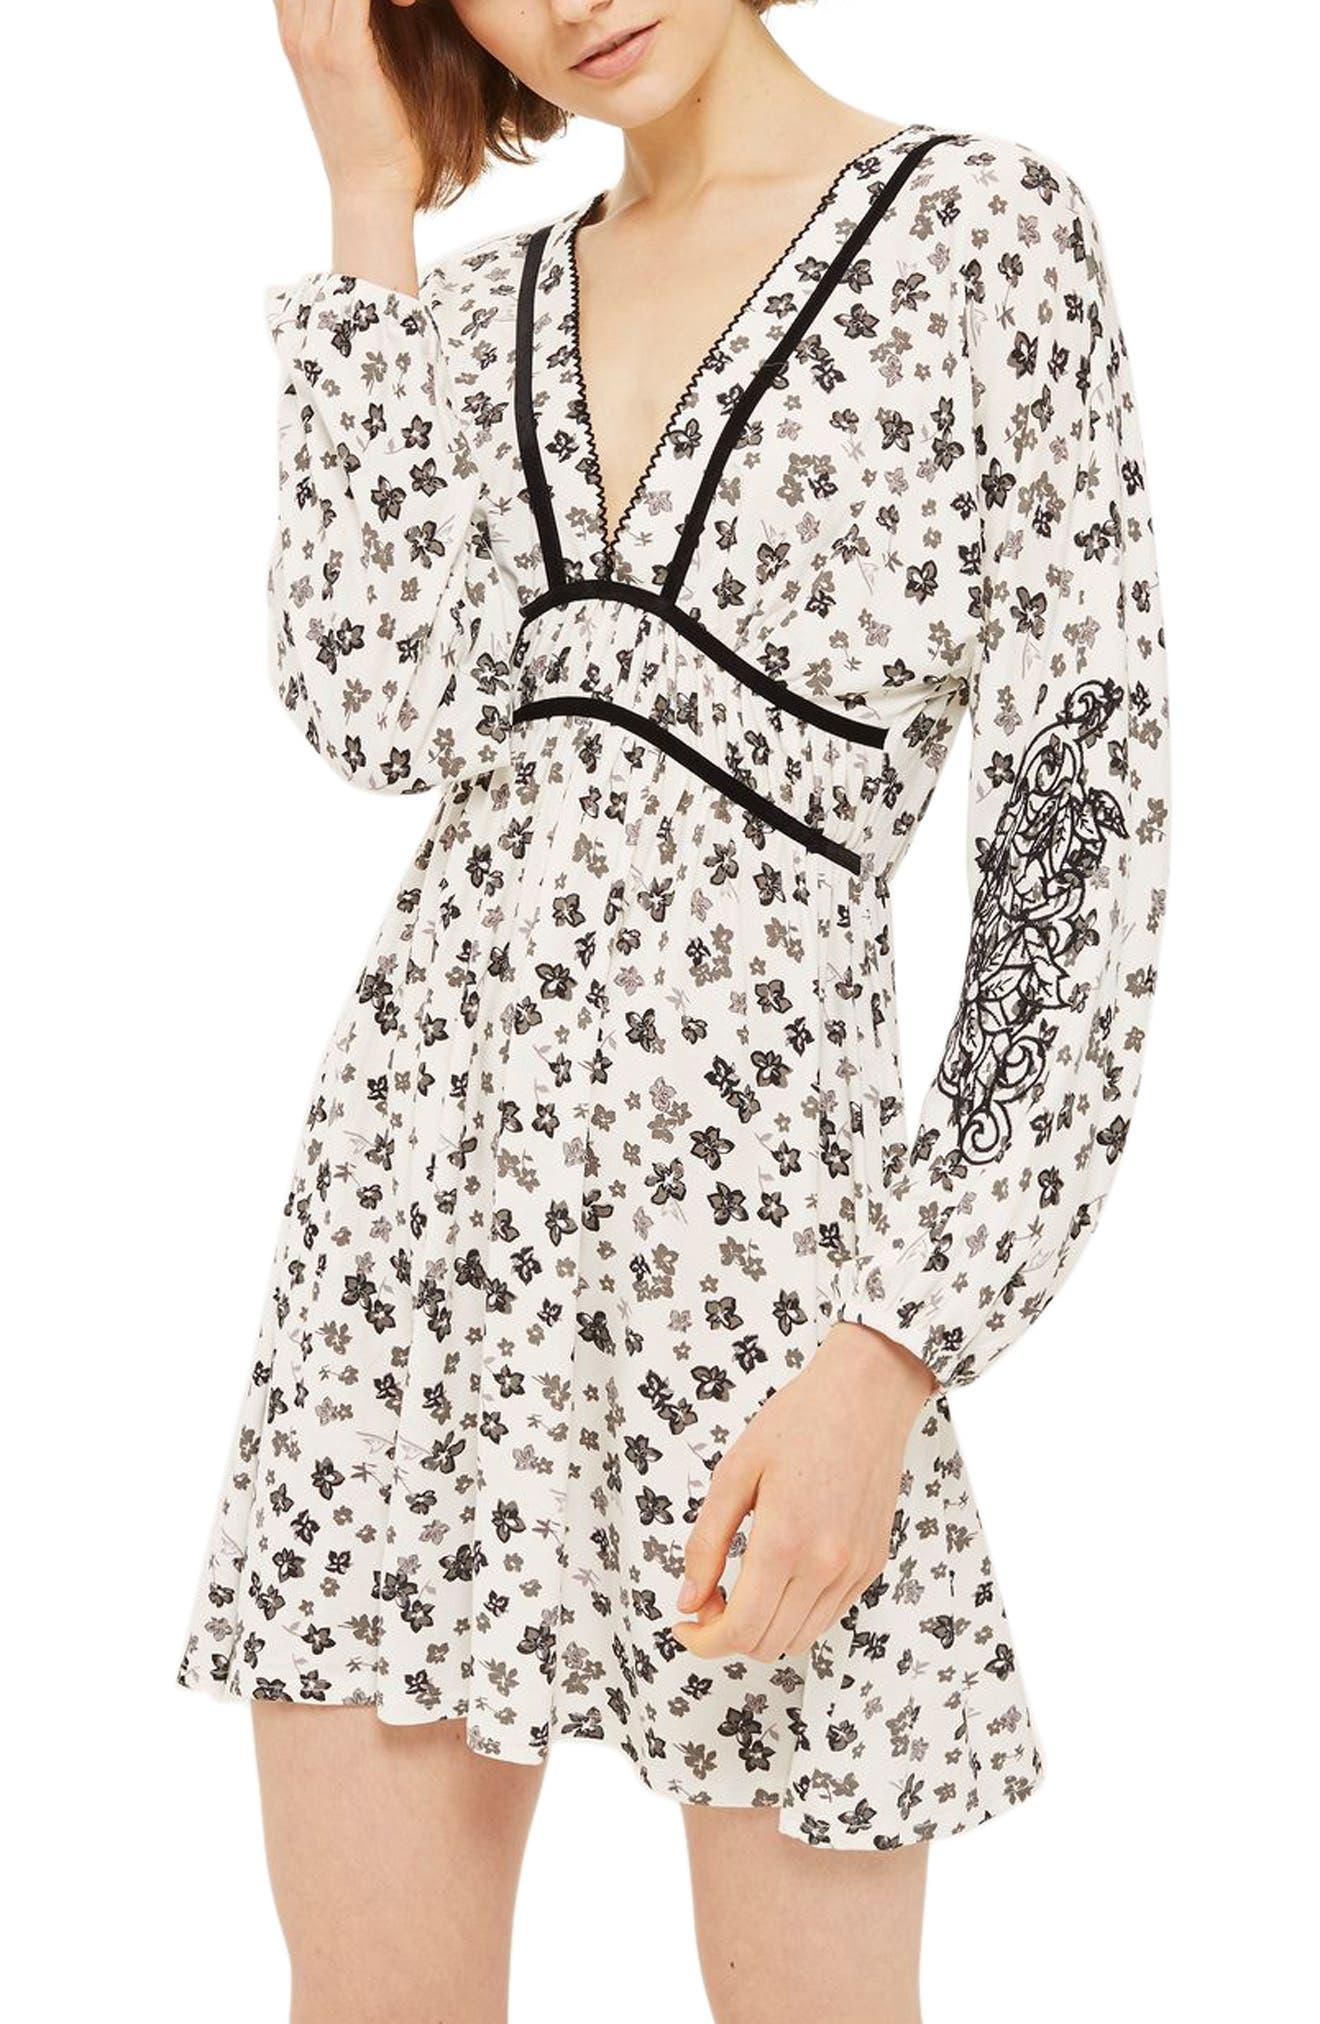 Topshop Floral Embroidered Tea Dress